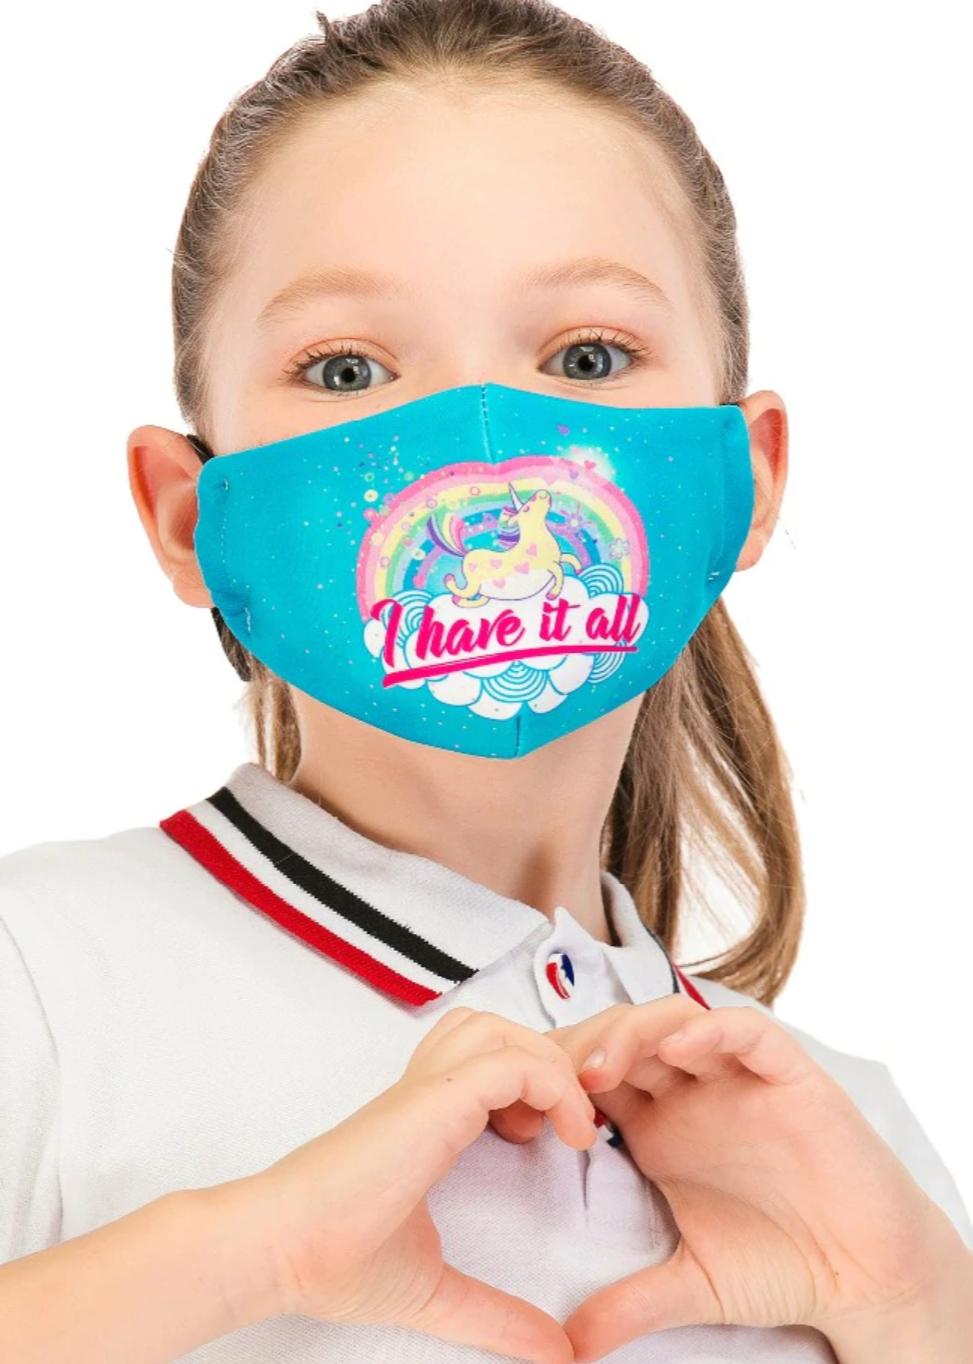 Adjustable Face Masks for Children (with filters)